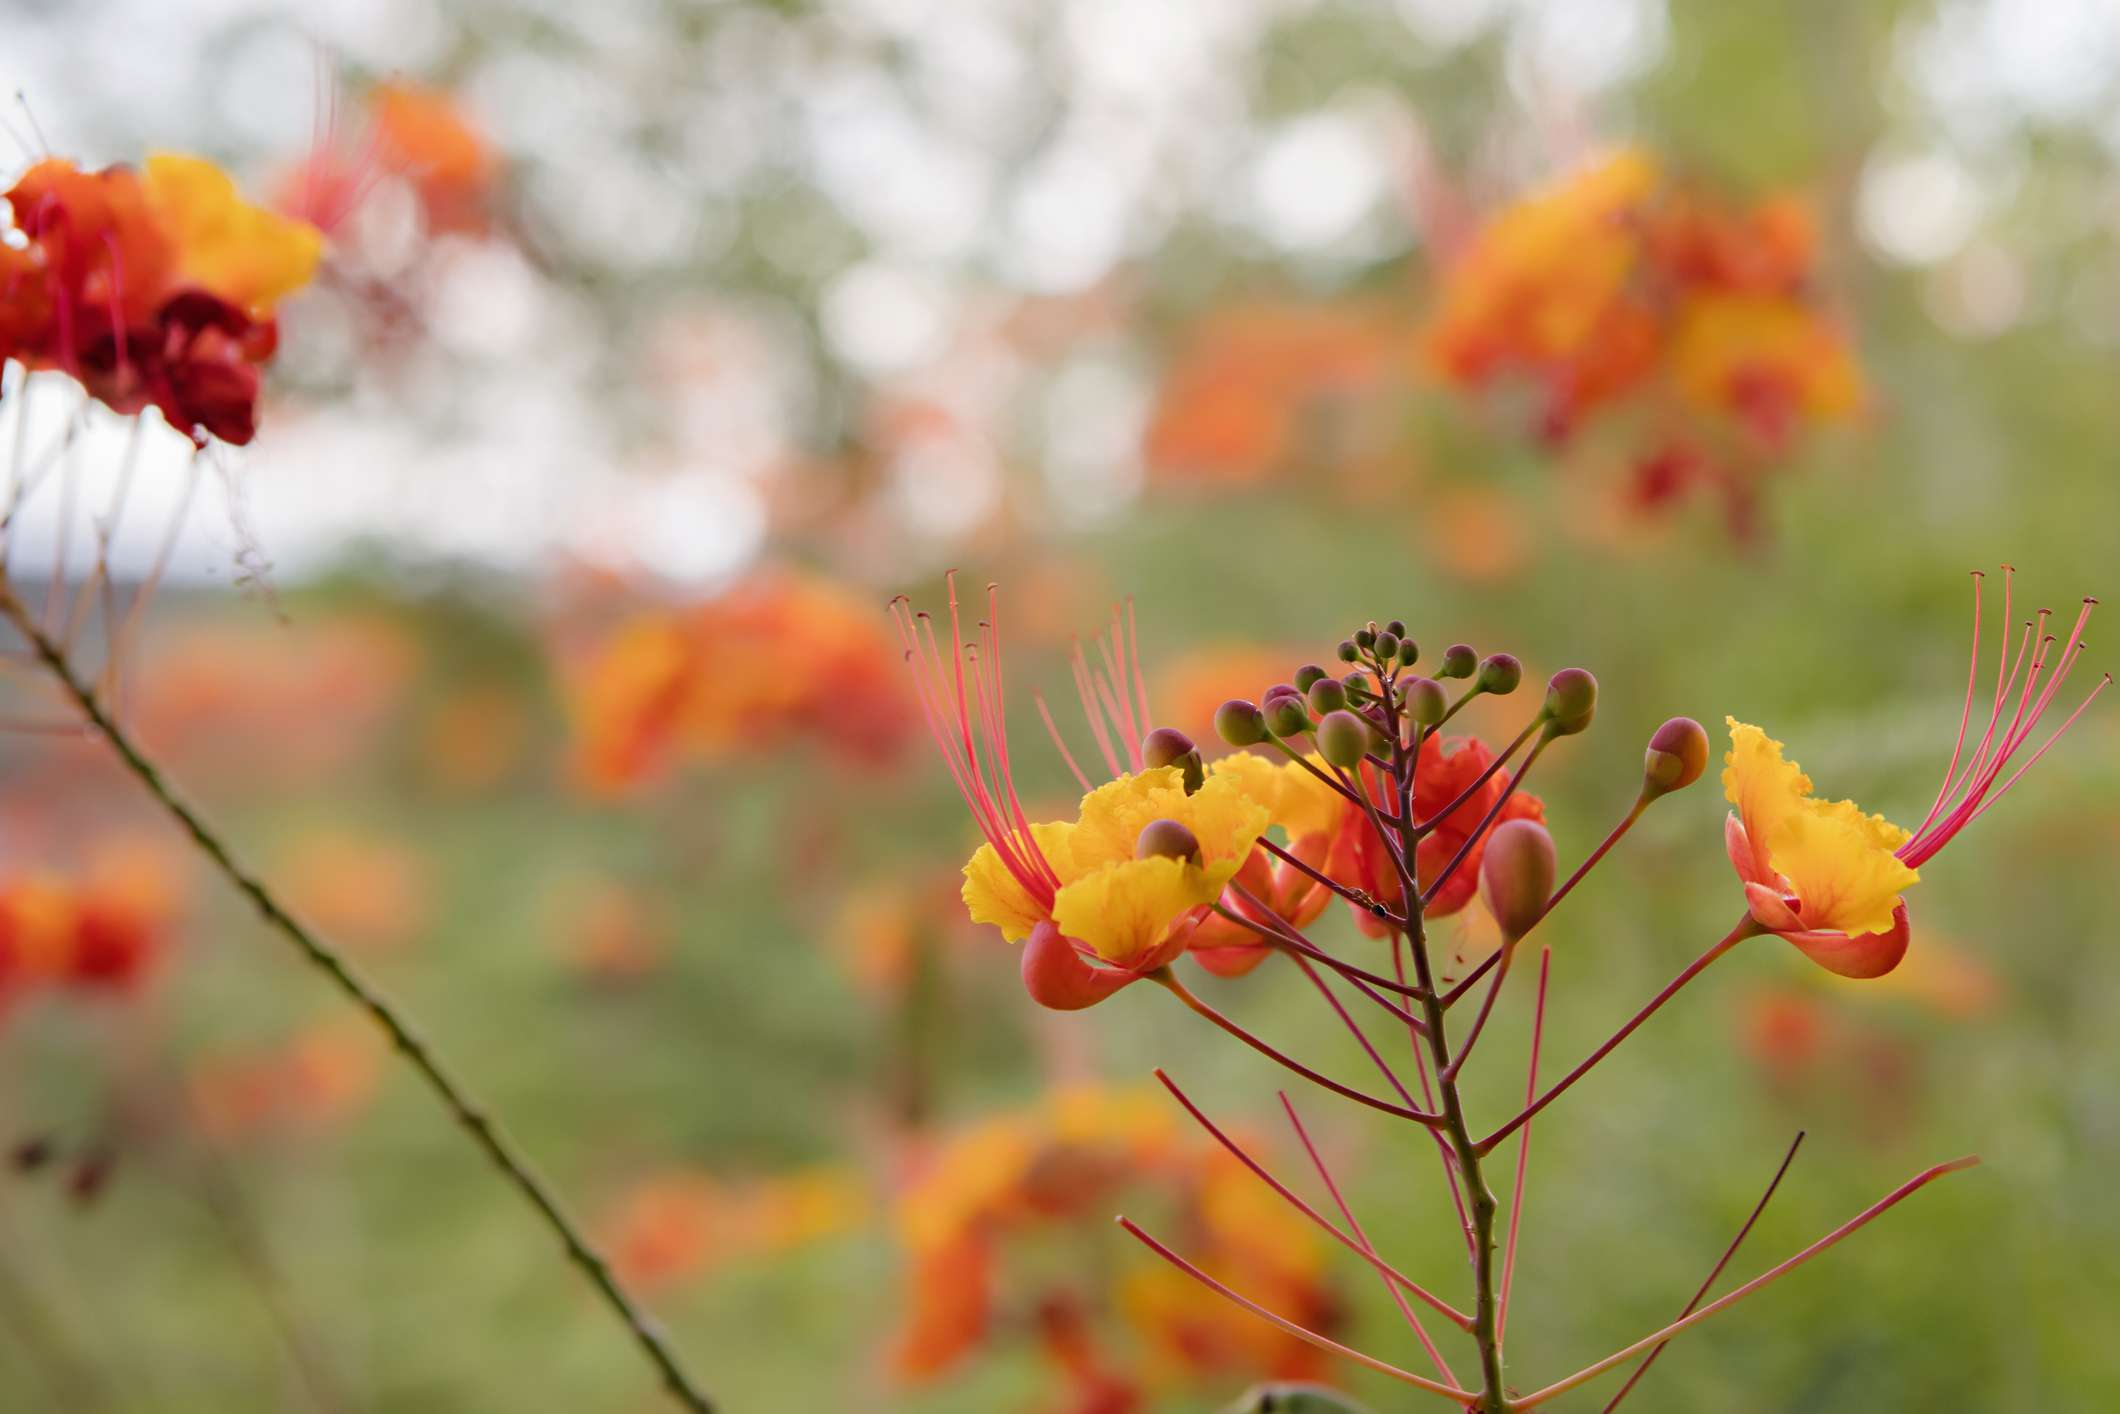 Red bird of paradise desert plant in bloom.